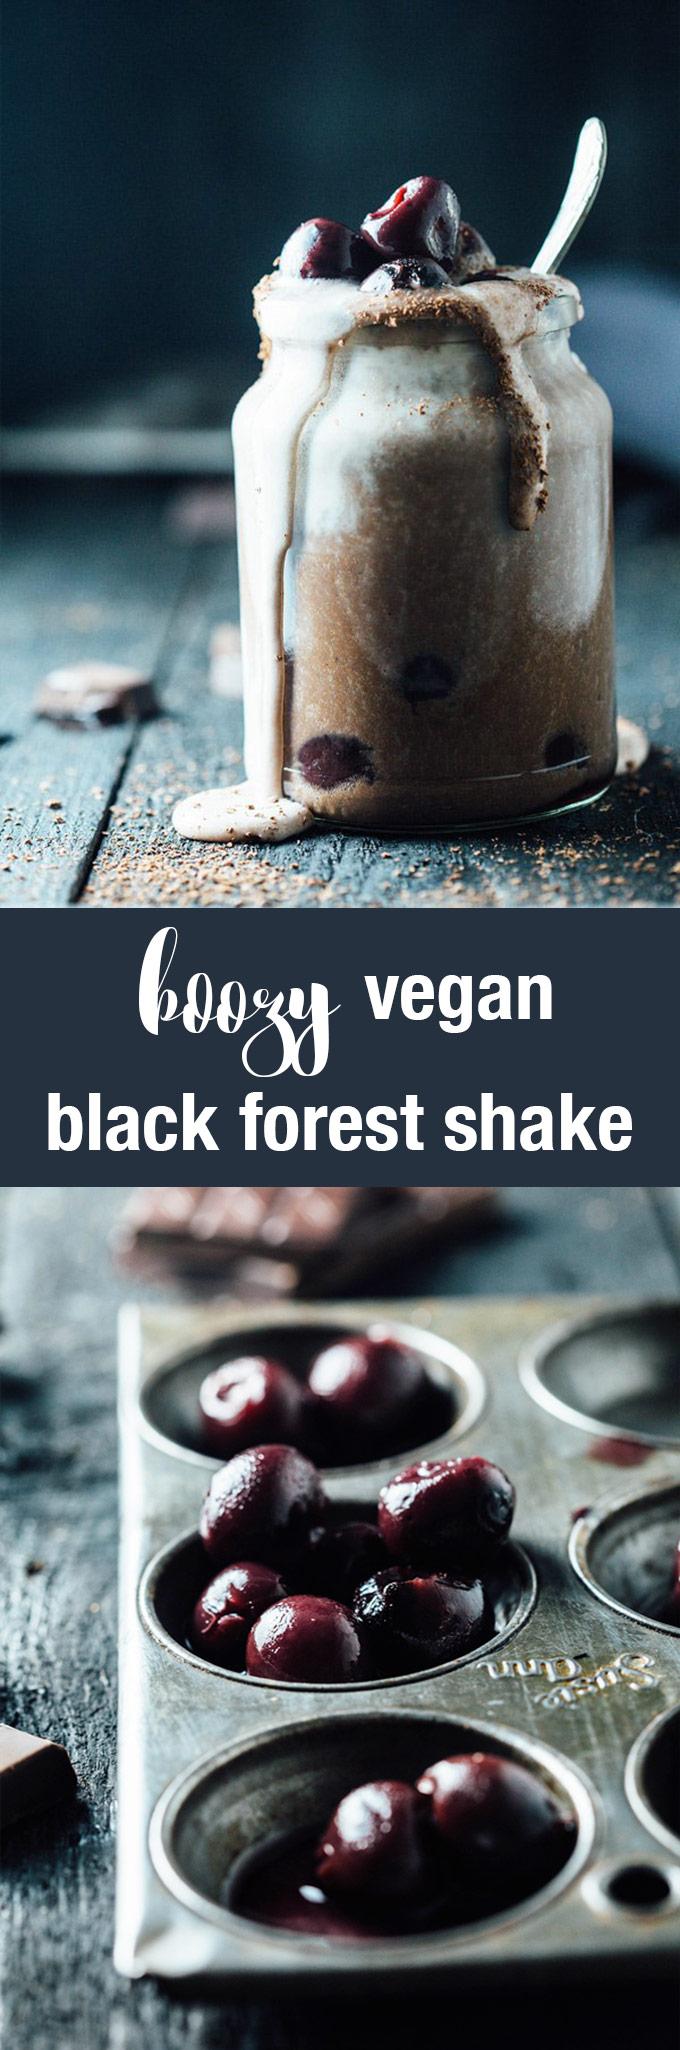 boozy-vegan-black-forest-shake-pin